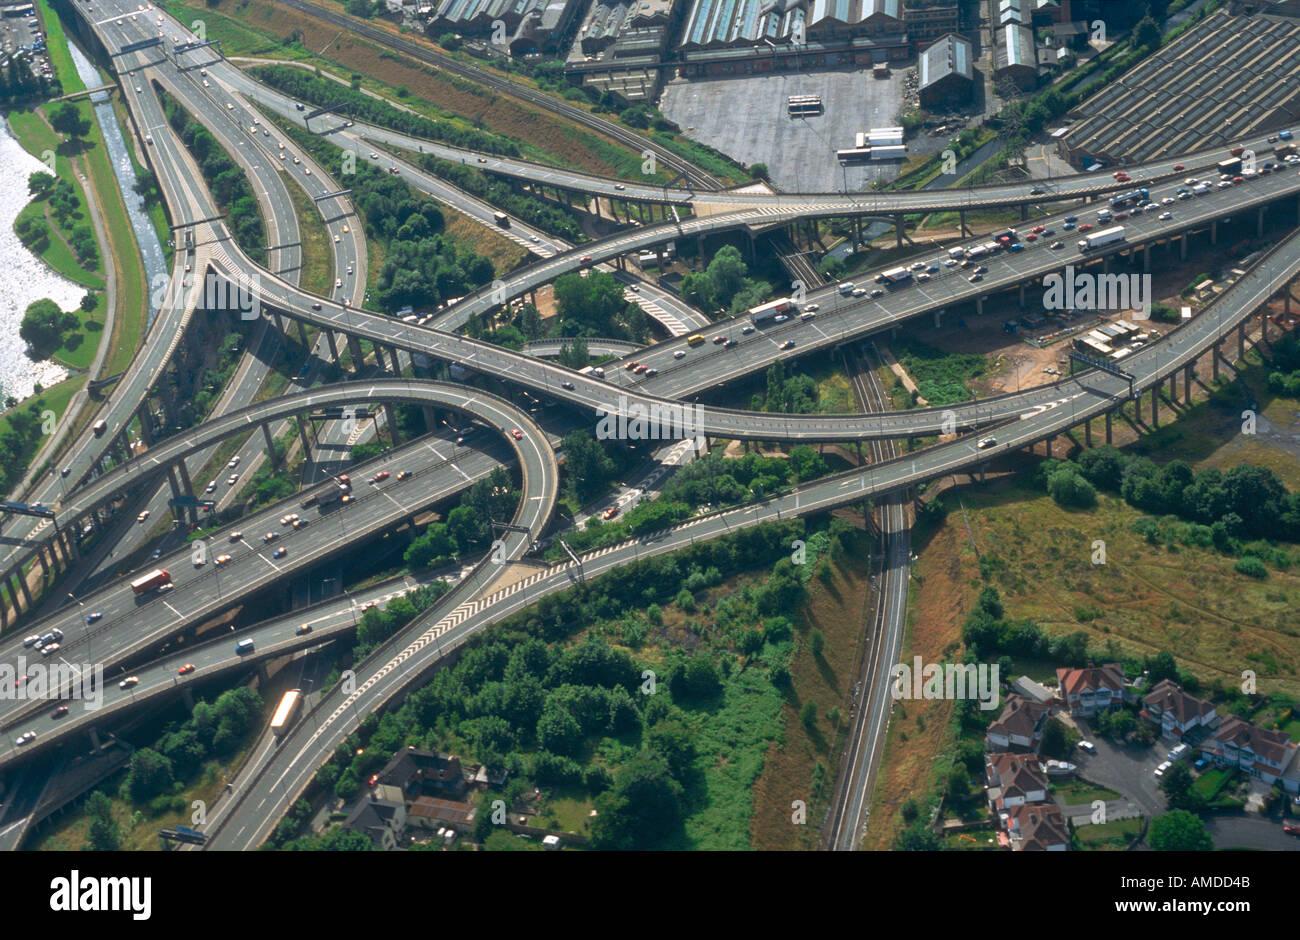 Aerail view of Spaghetti Junction, Birmingham - Stock Image